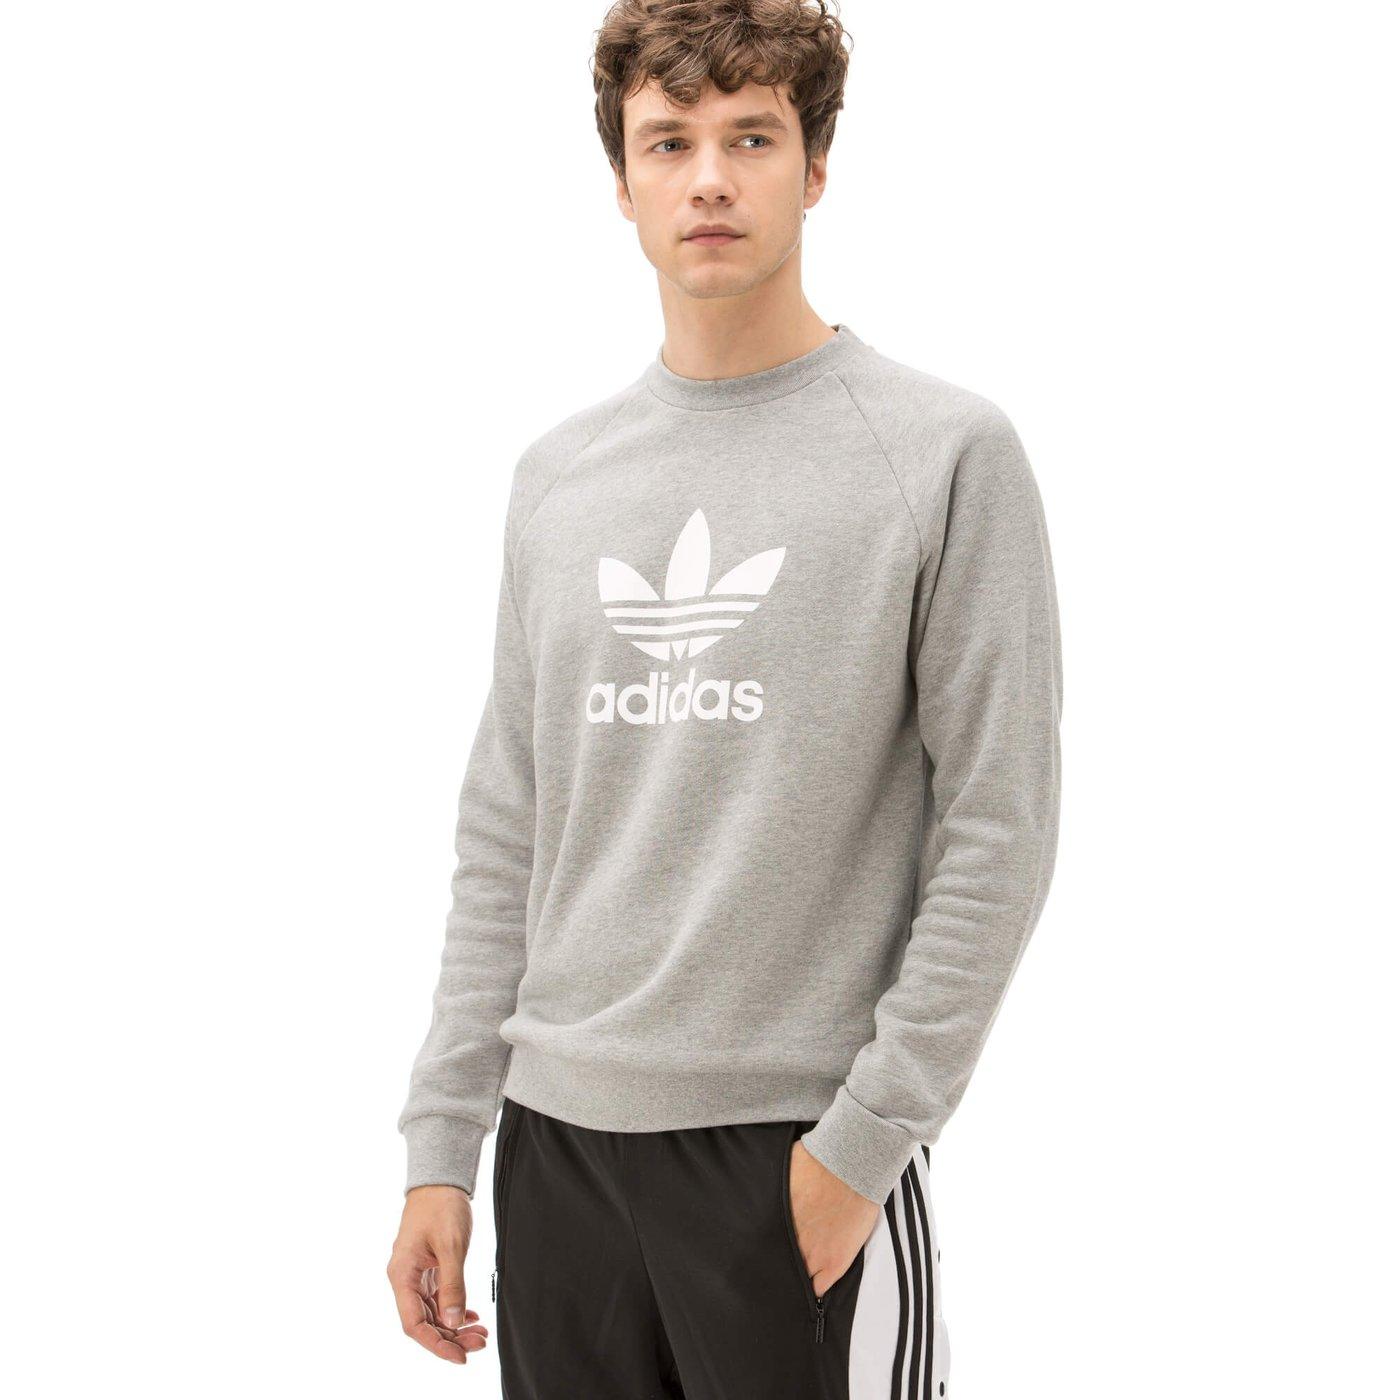 adidas Trefoil Erkek Gri Sweatshirt